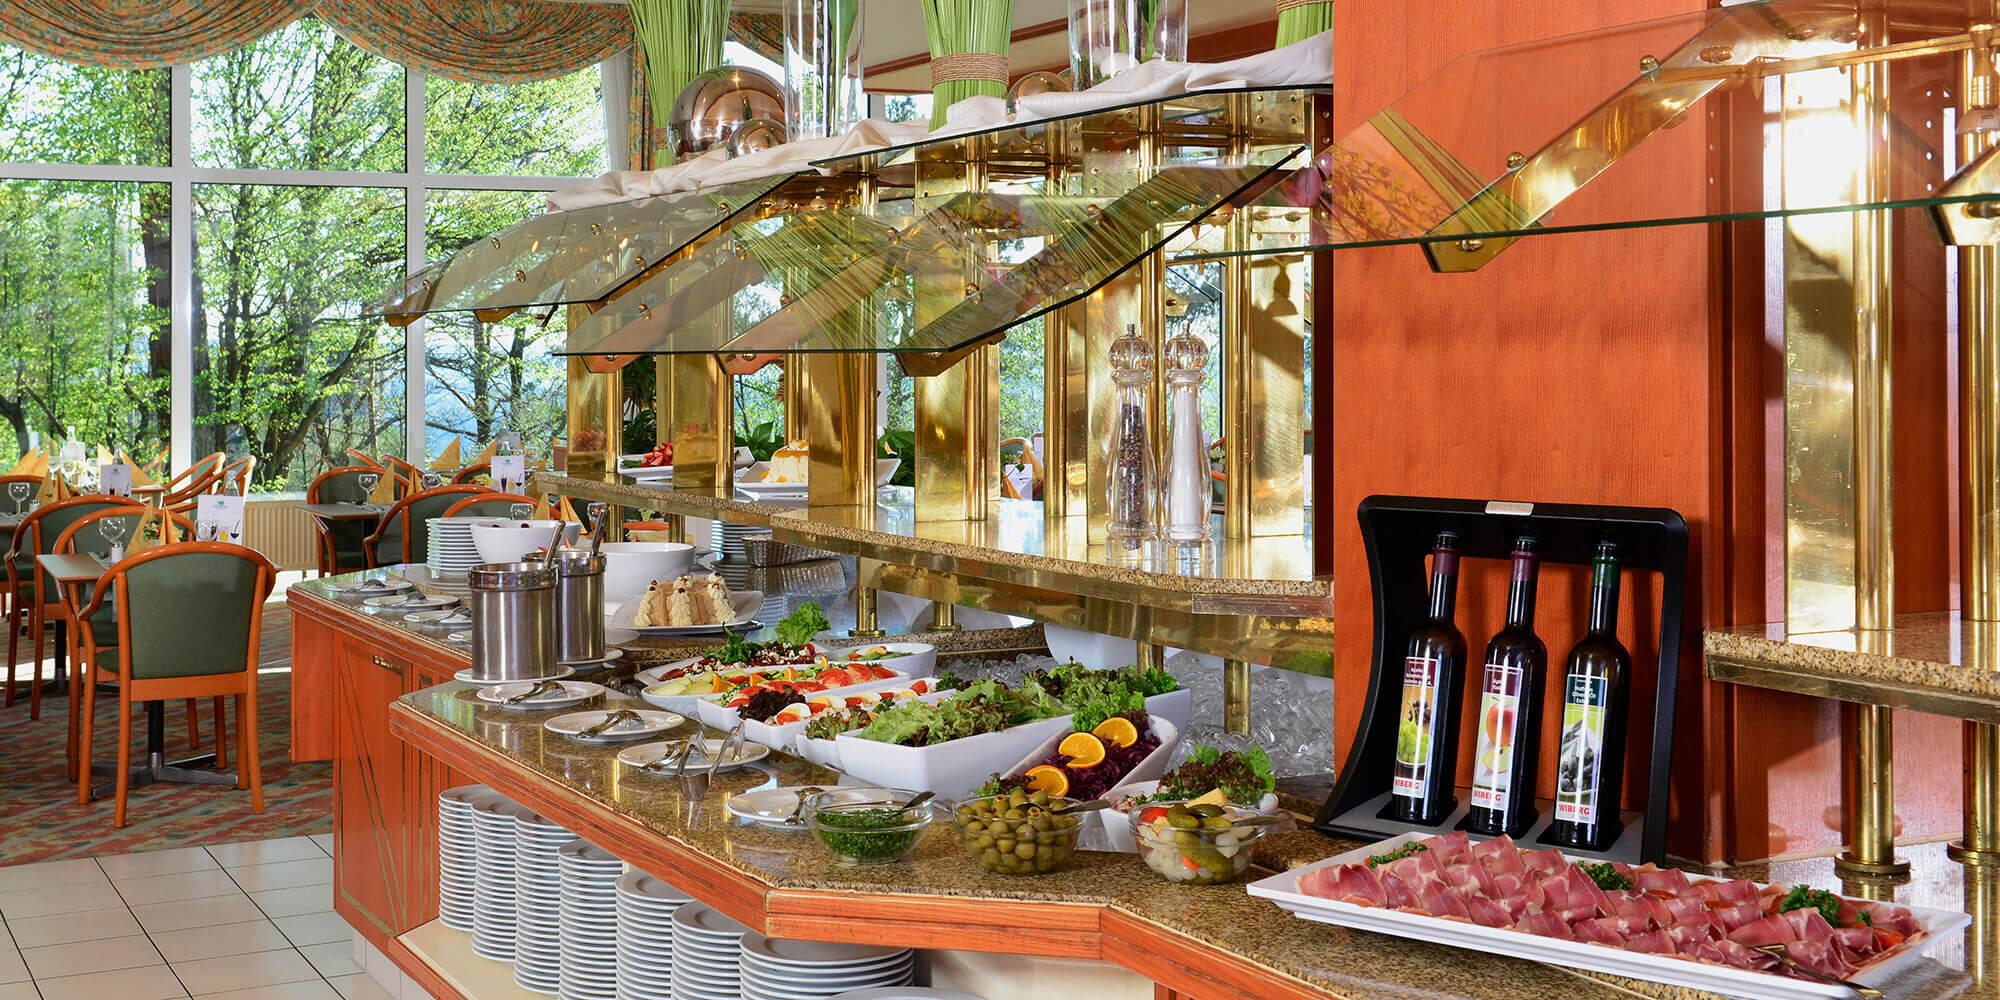 GranCanariaFoto-Hotel-Restaurant-Dirk-Holst-DHSTUDIO-406